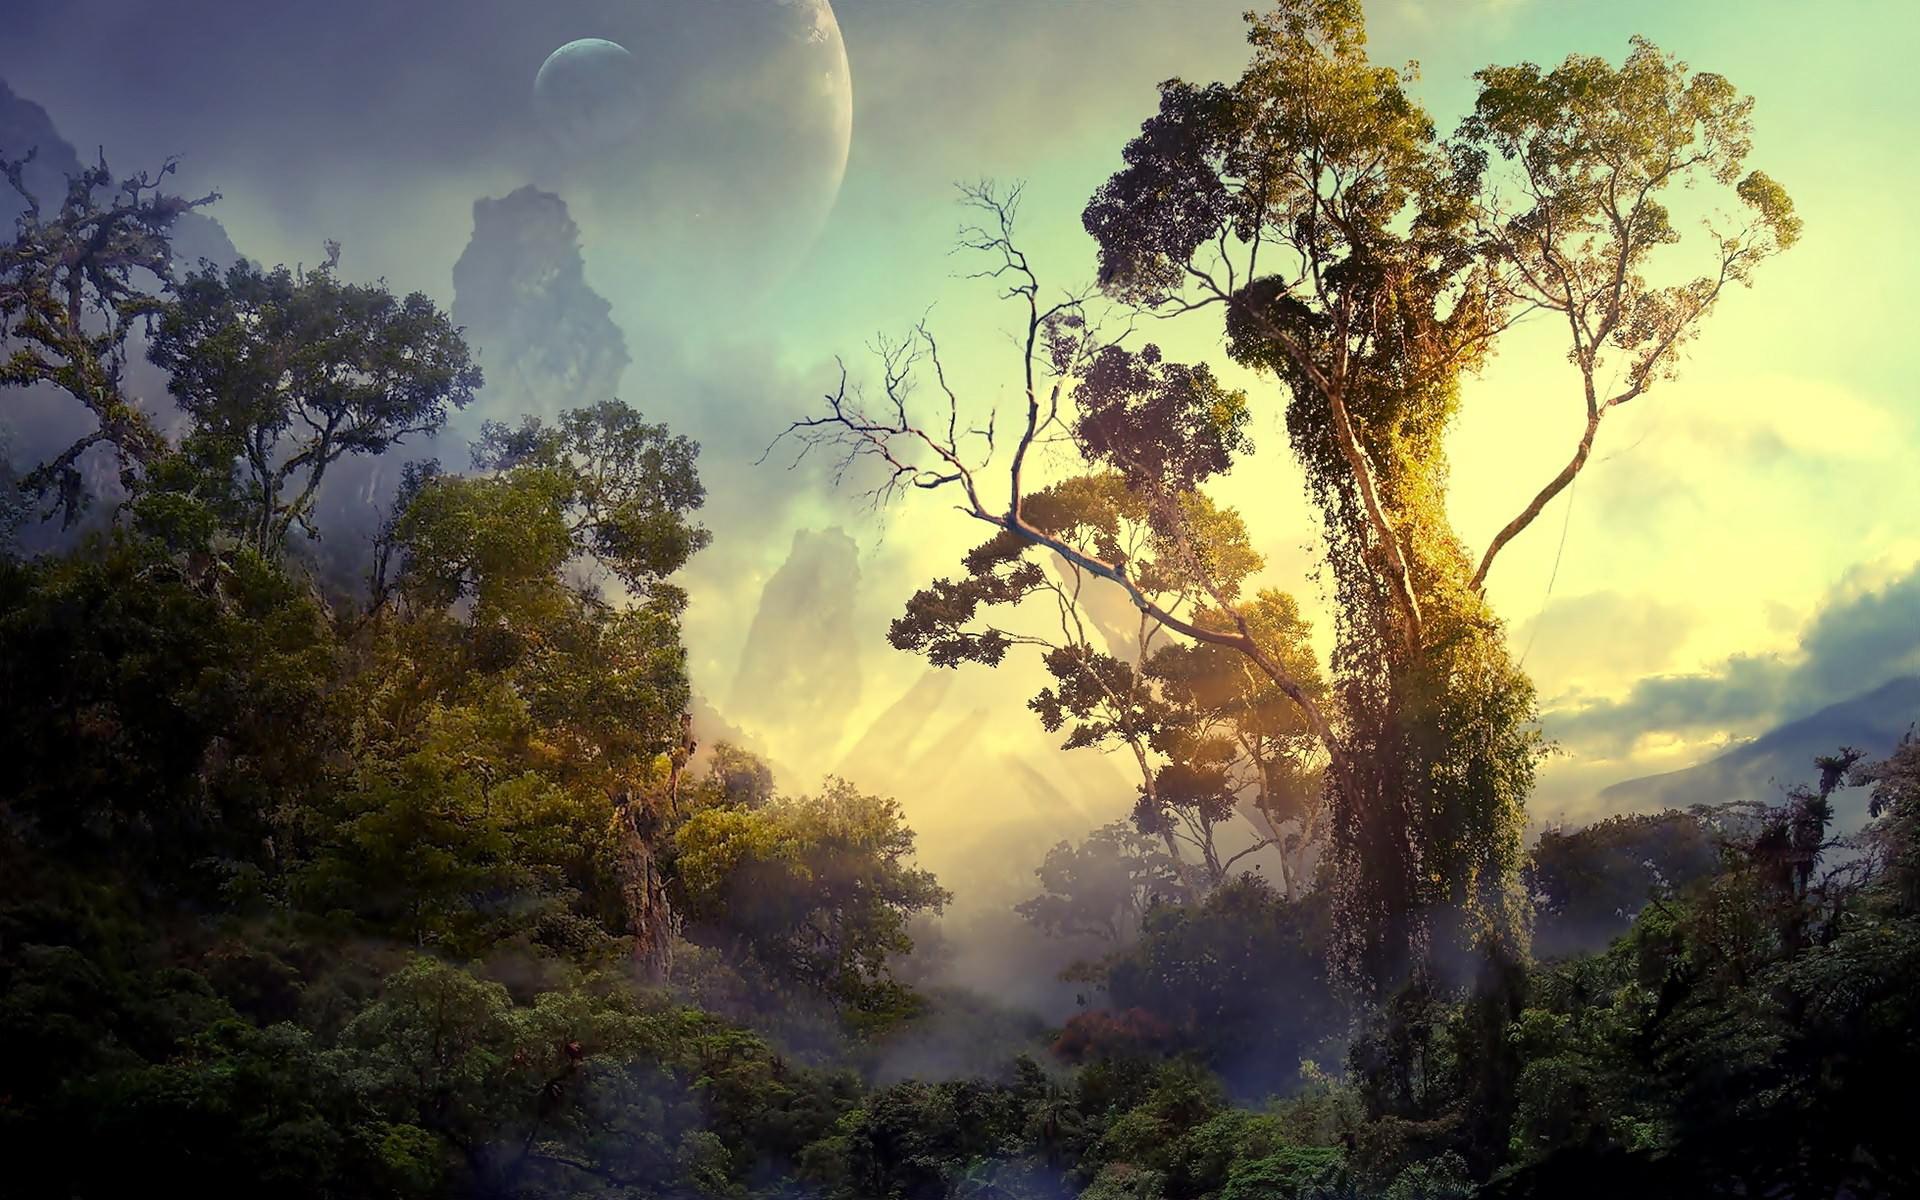 In the alien jungle